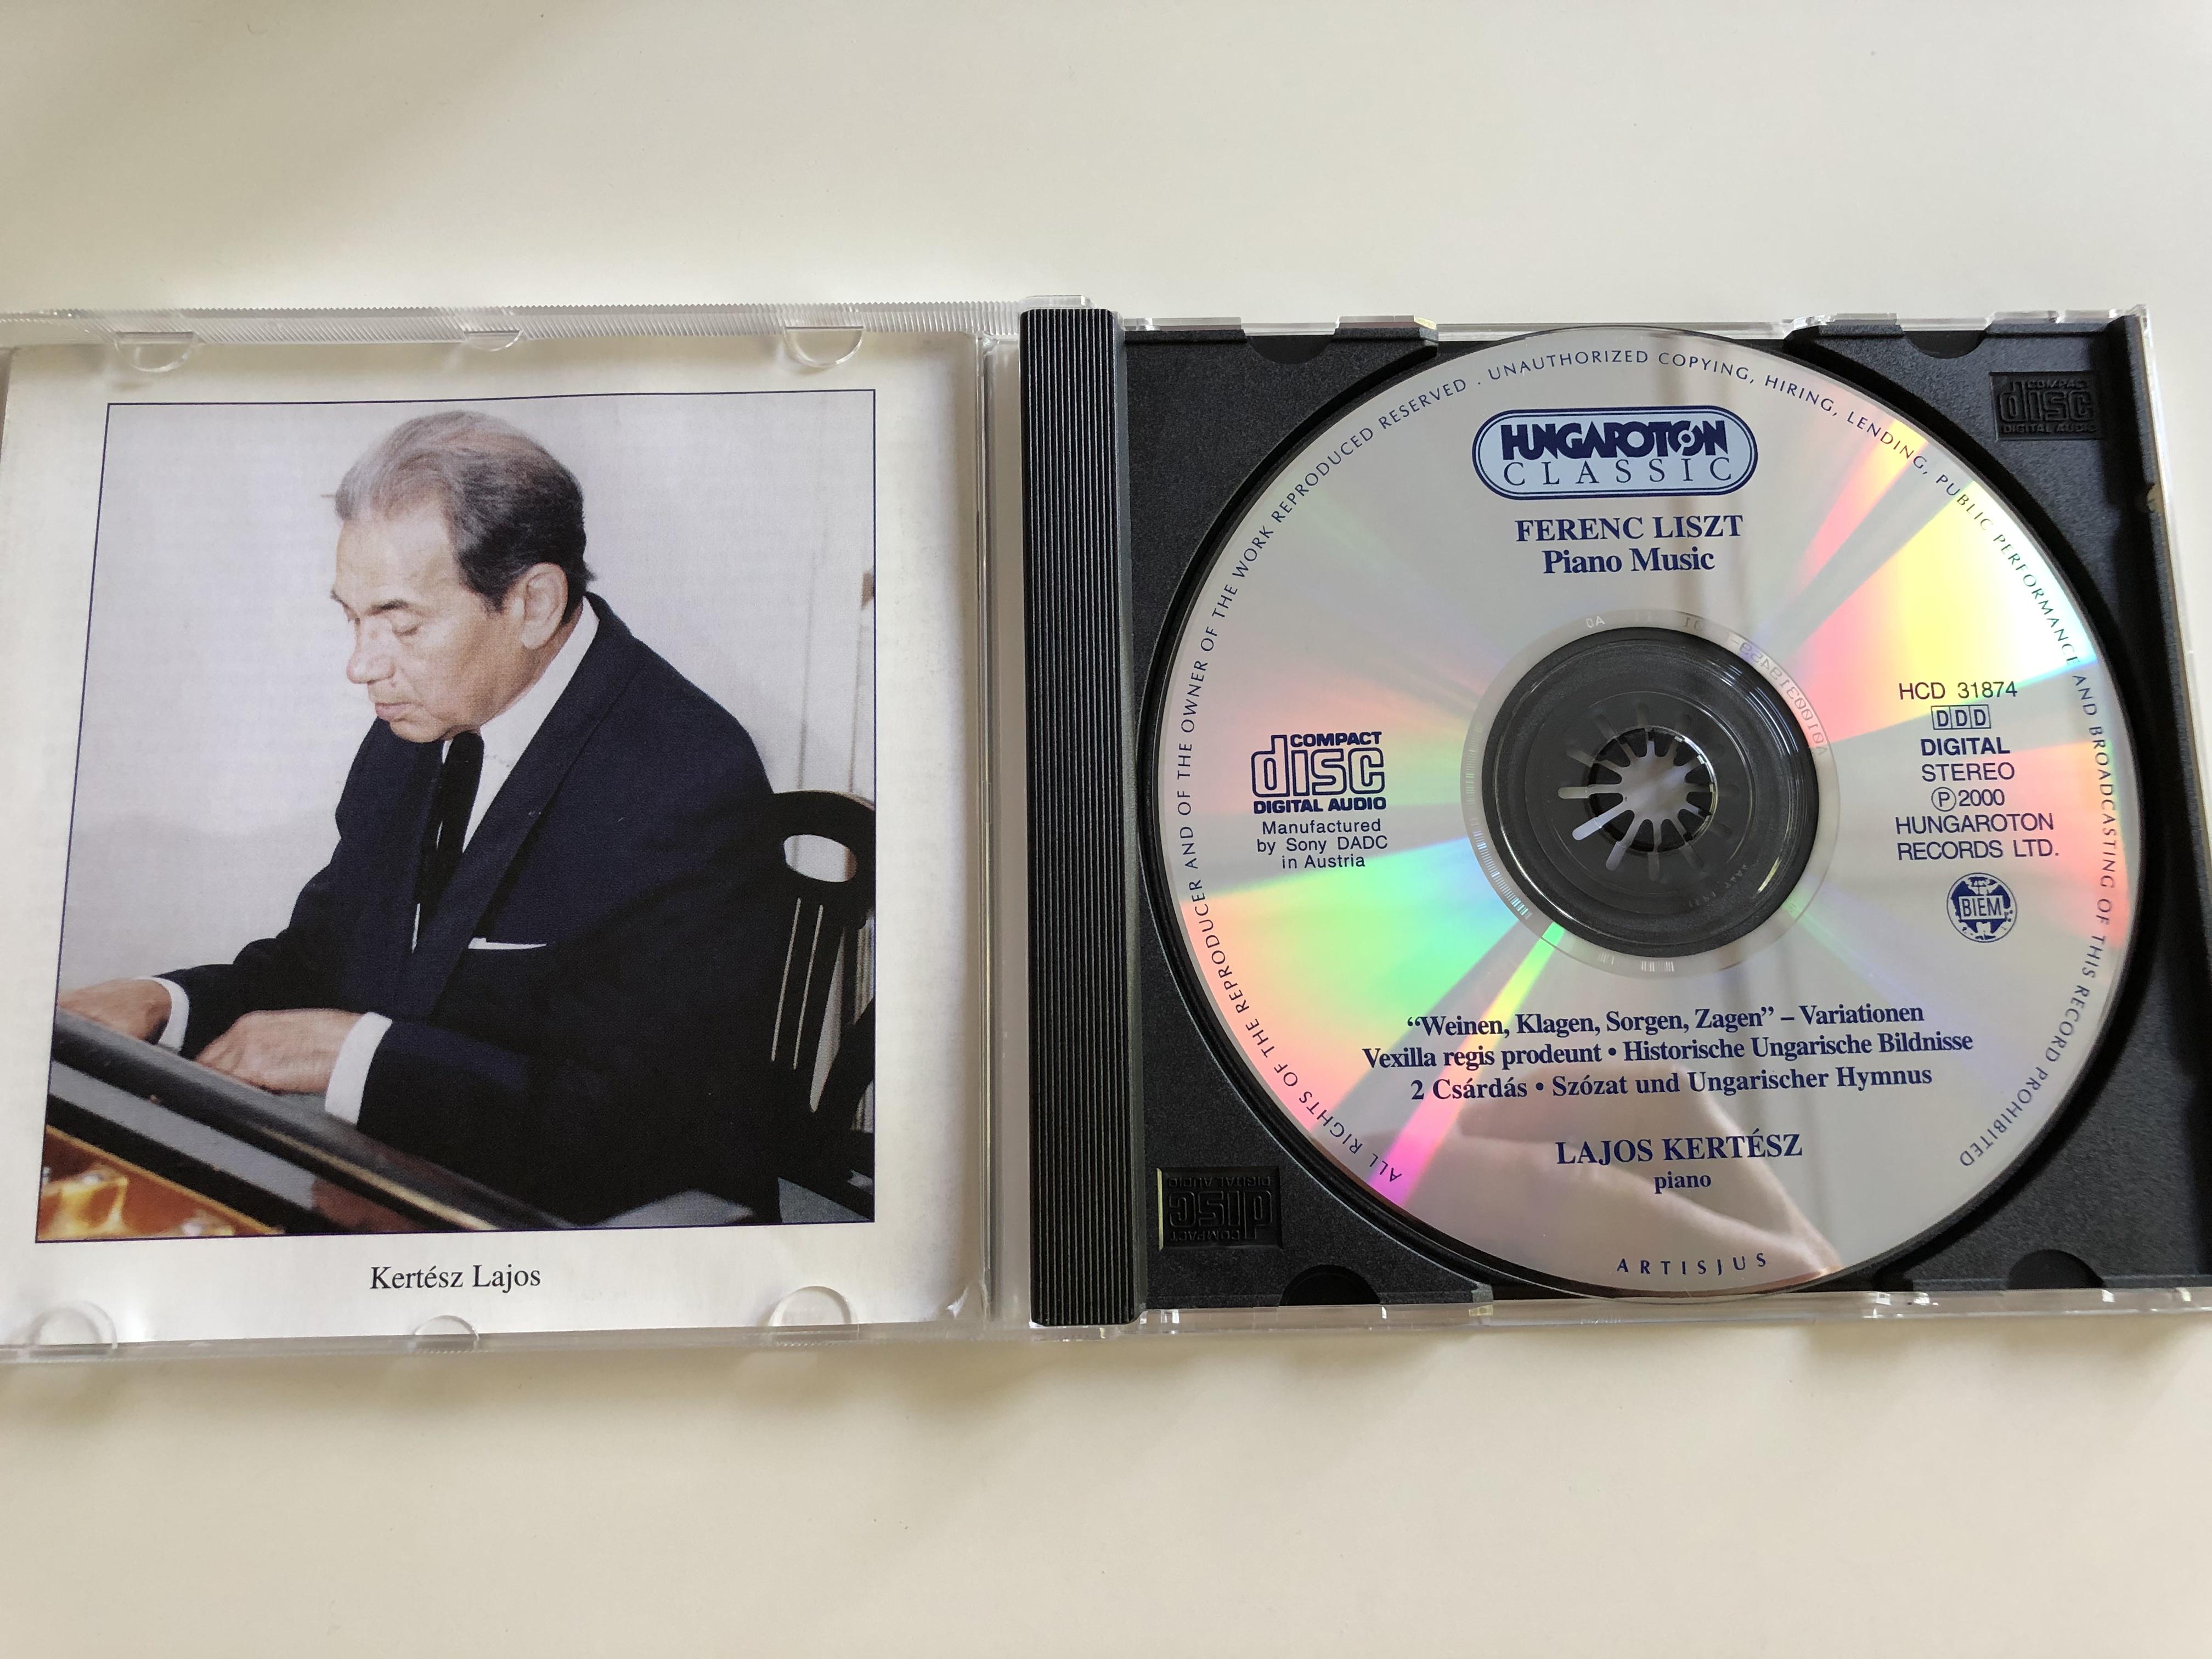 liszt-piano-music-weinen-klagen-sorgen-zagen-variationen-vexilla-regis-prodeunt-historische-ungarische-bildnisse-2-cs-rd-s-sz-zat-und-ungarischer-hymnus-lajos-kert-sz-piano-hungaroton-classic-hcd-31874-5-.jpg